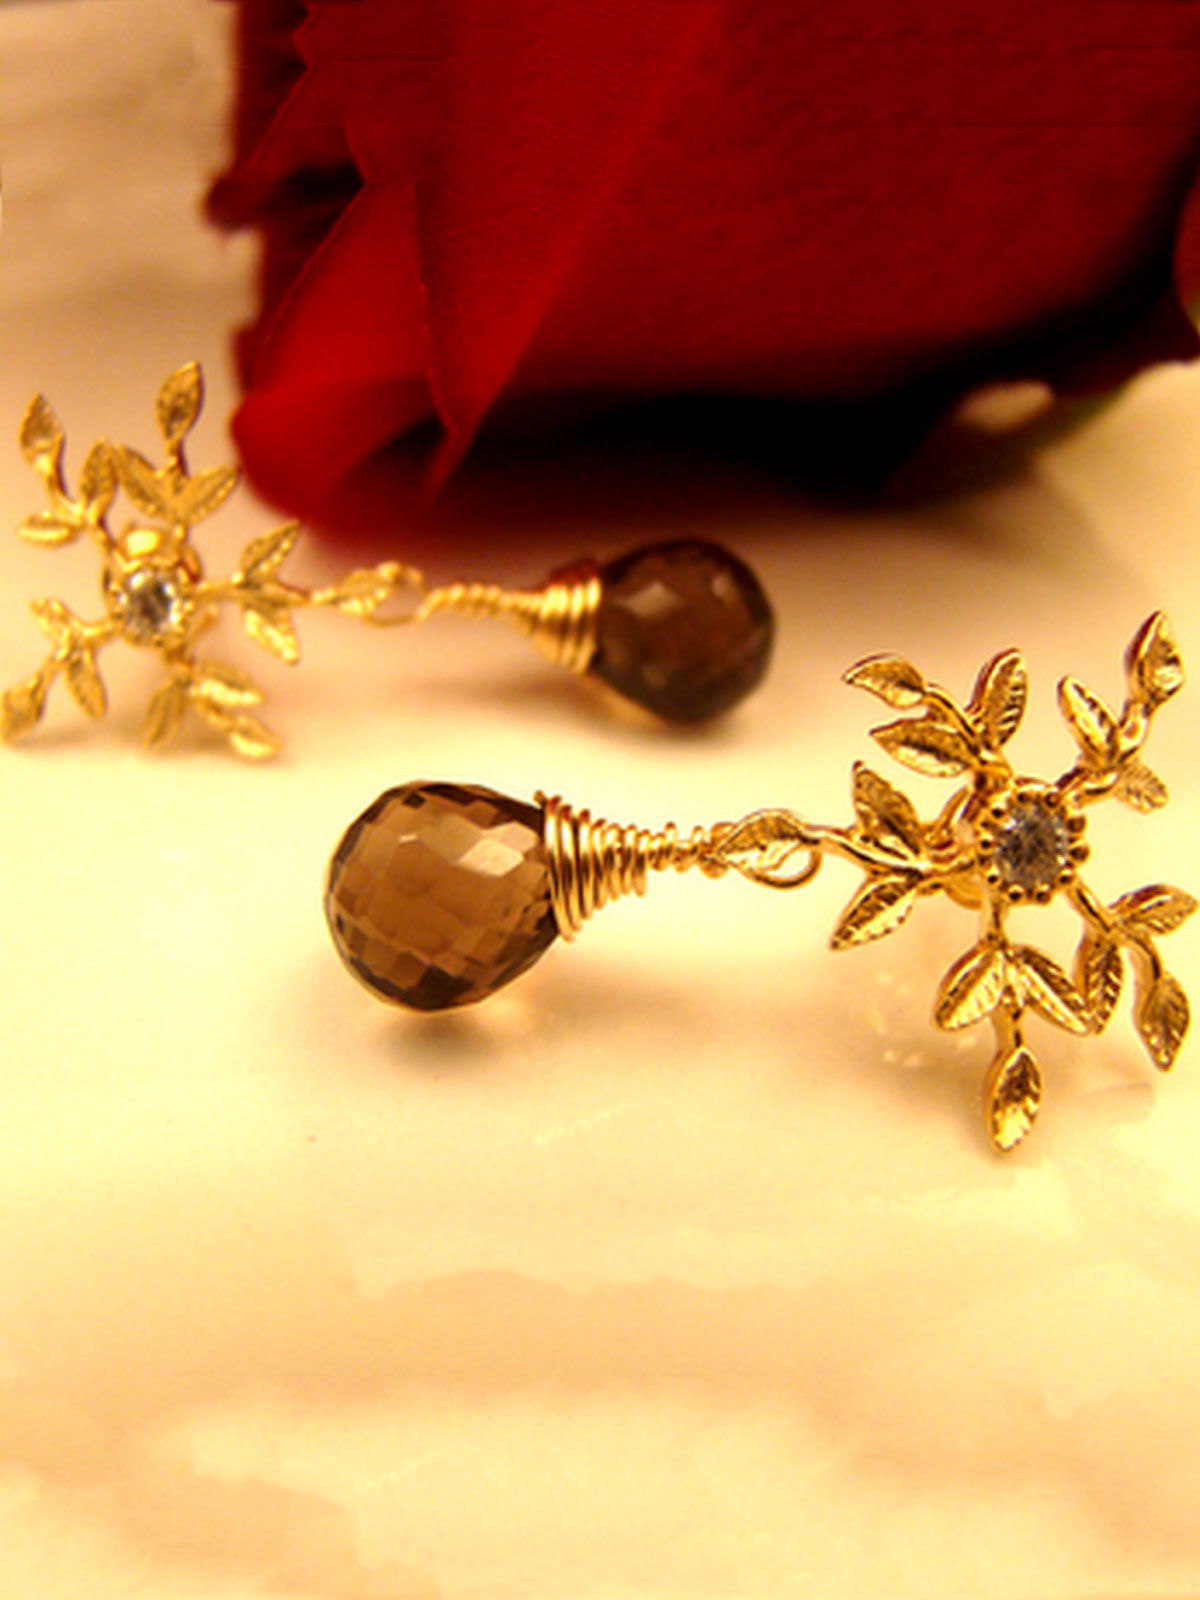 Snowflakes with Smoky quartz earrings